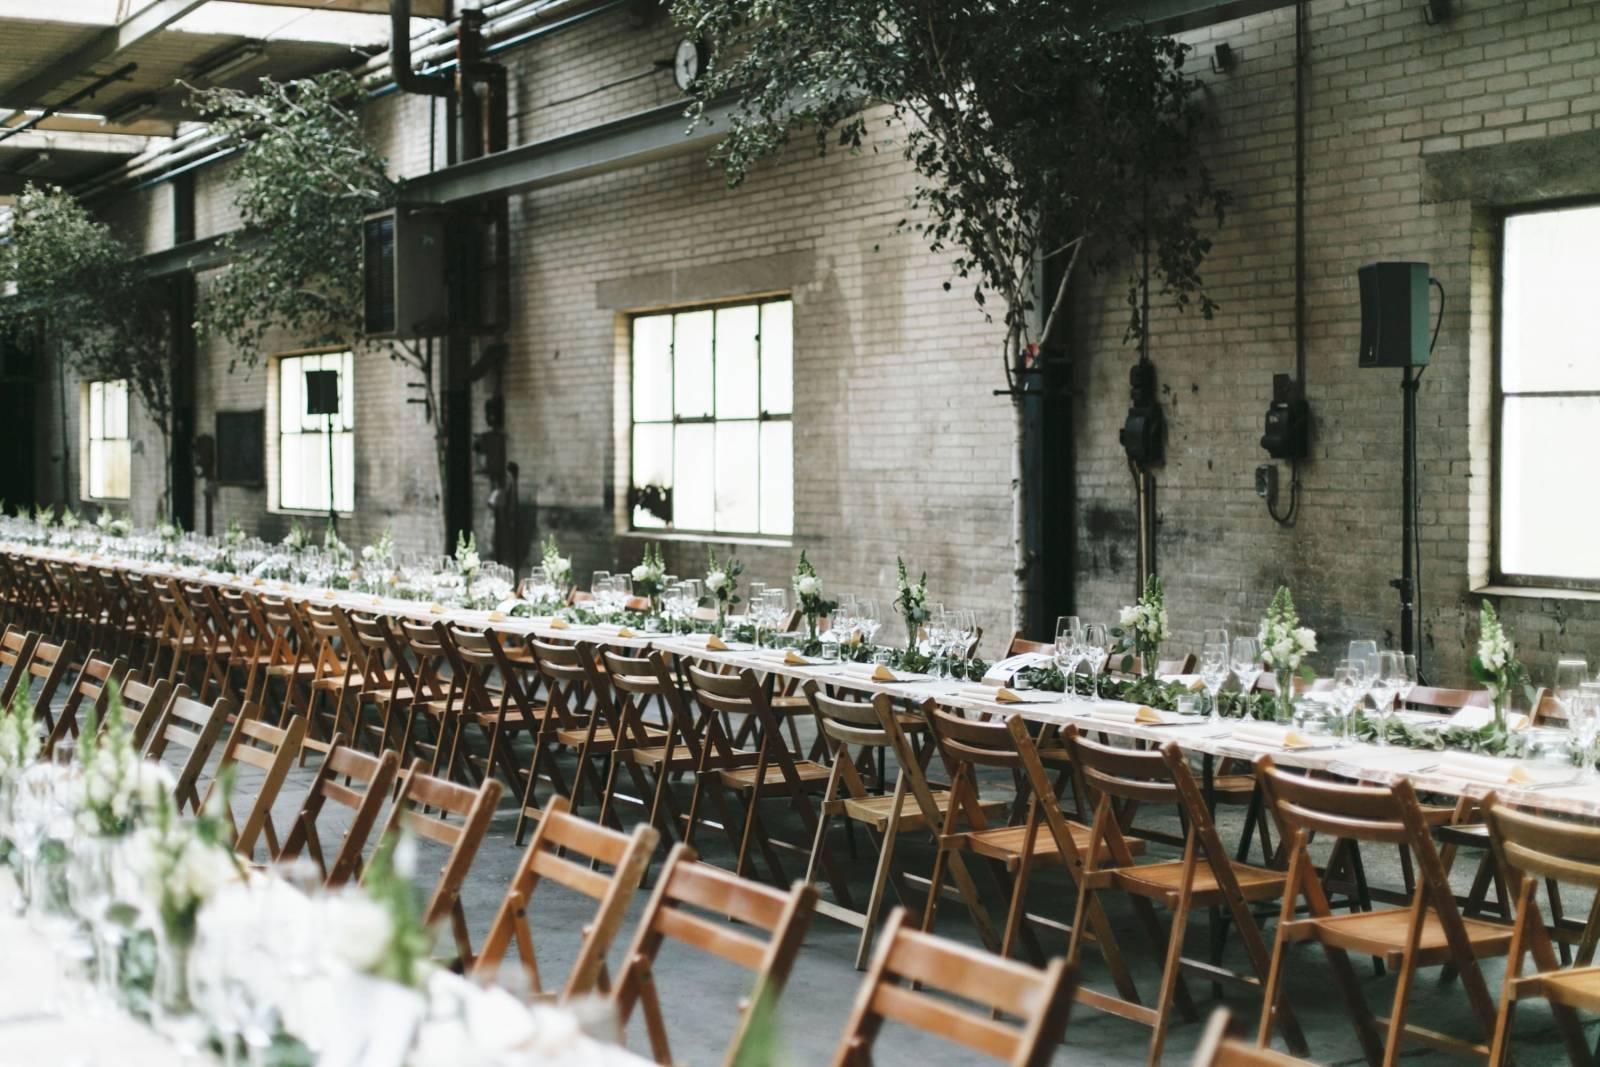 Carpe Diem Bloemen & Decoratie - House of Weddings  - 42